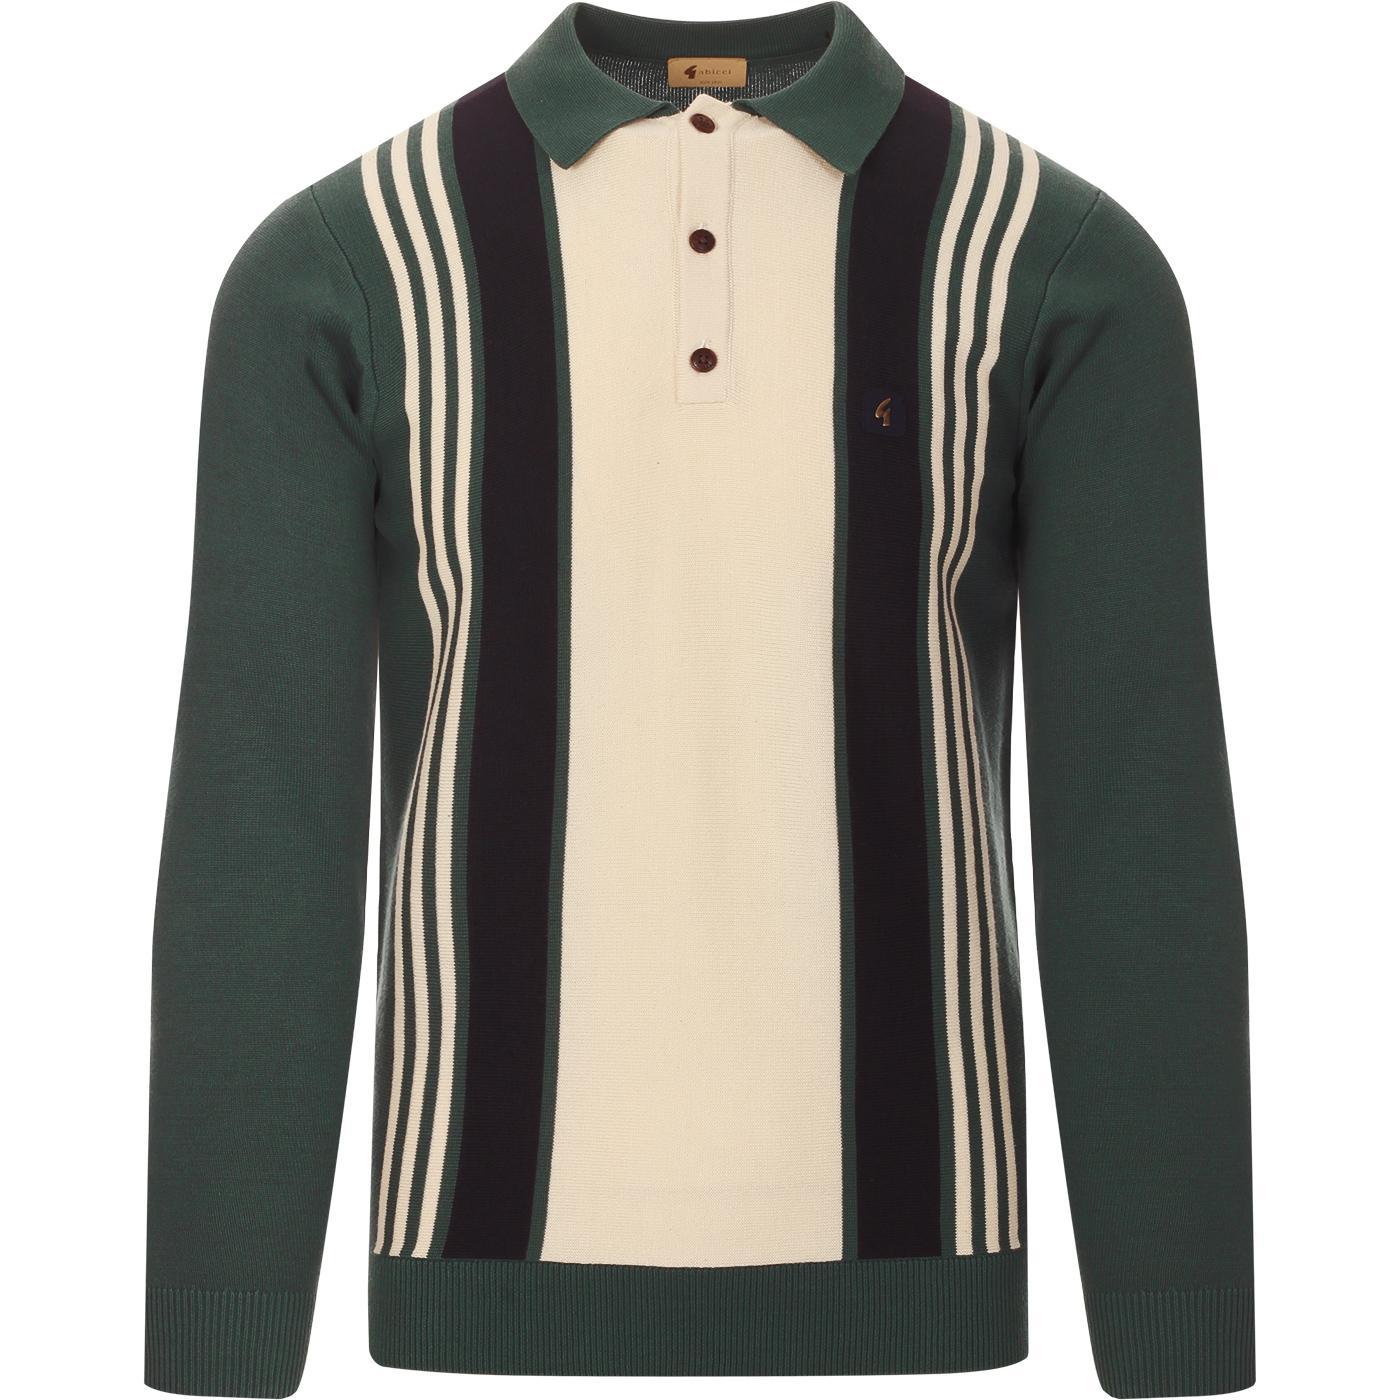 Searle GABICCI VINTAGE 60s Mod Knit Polo -Juniper